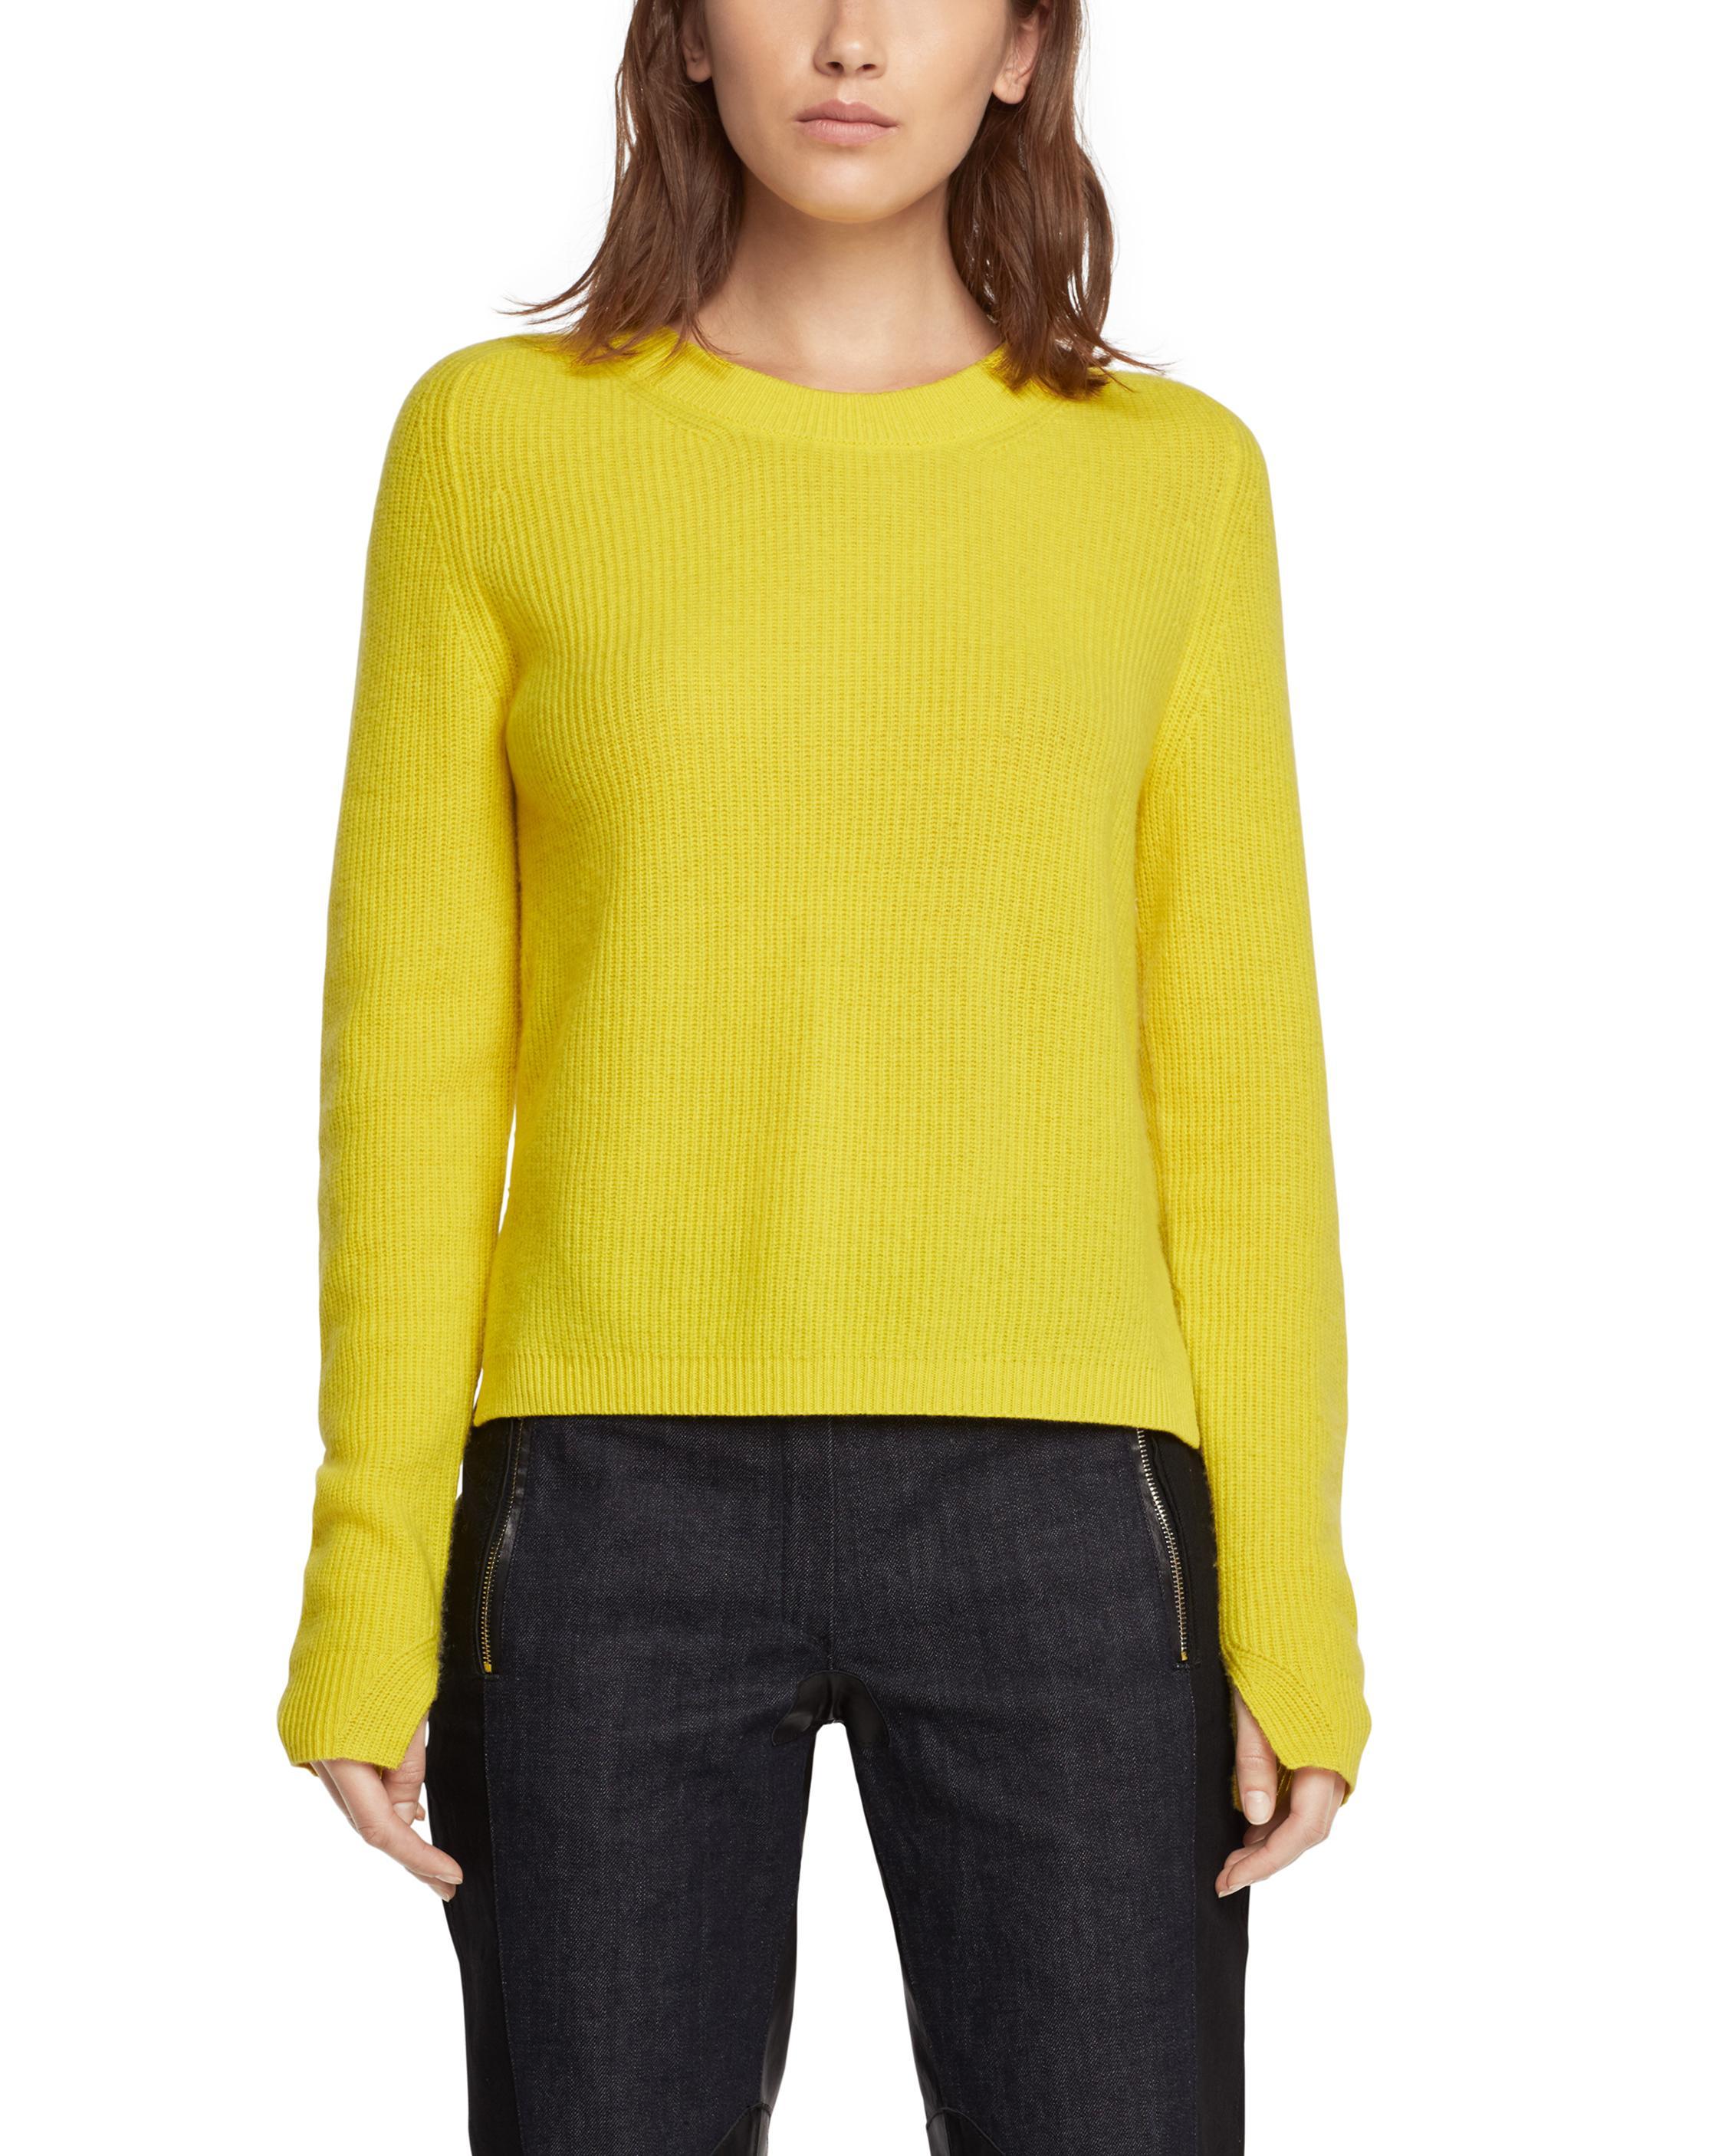 Valentina Crop Sweater | Women's Tops | rag & bone